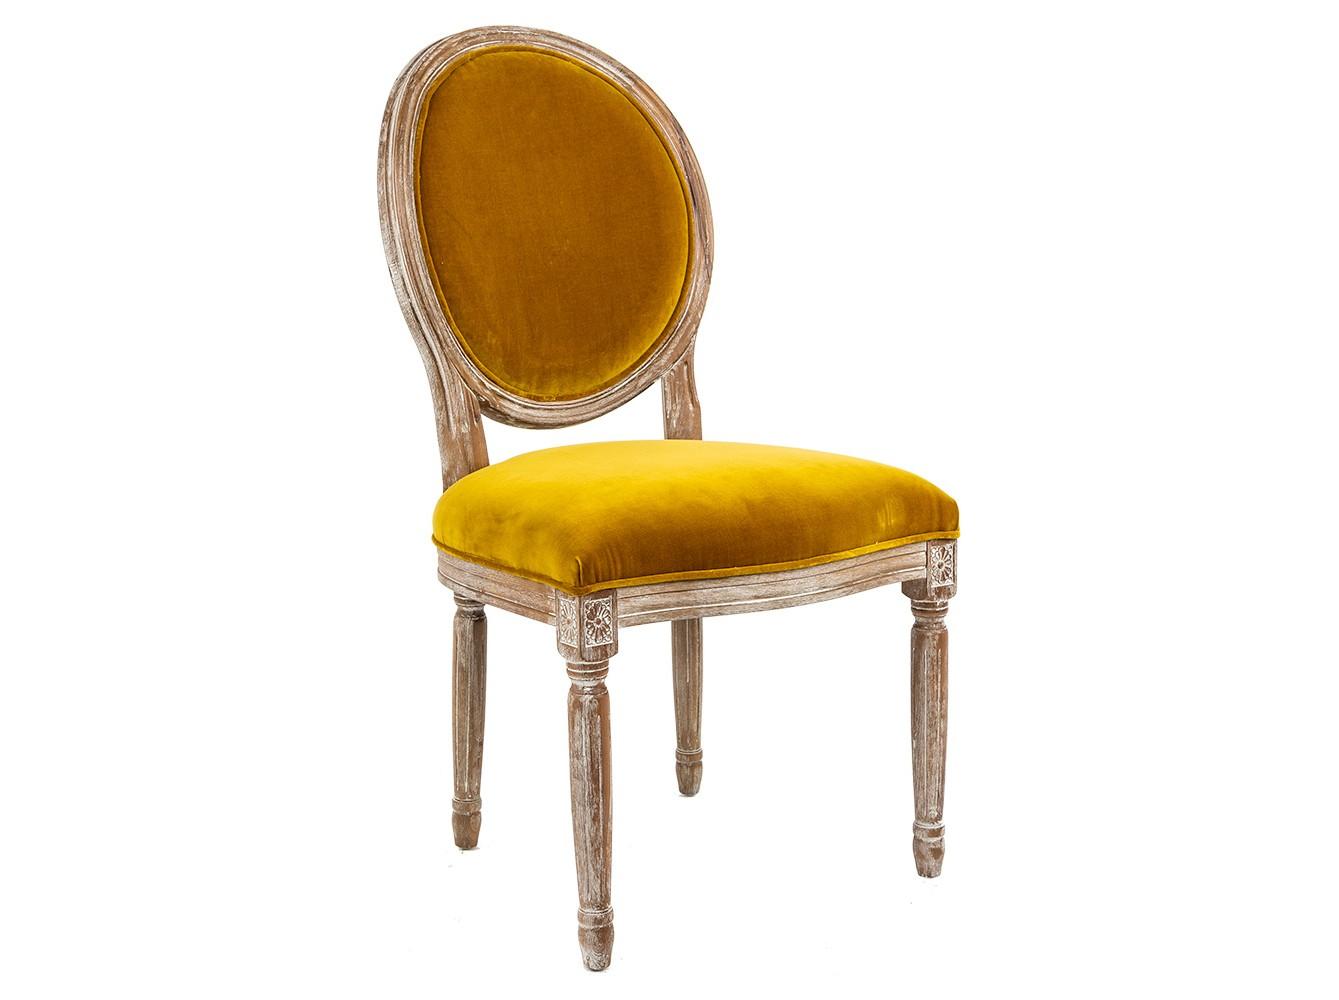 Кухонный стул Object Desire 15438272 от thefurnish